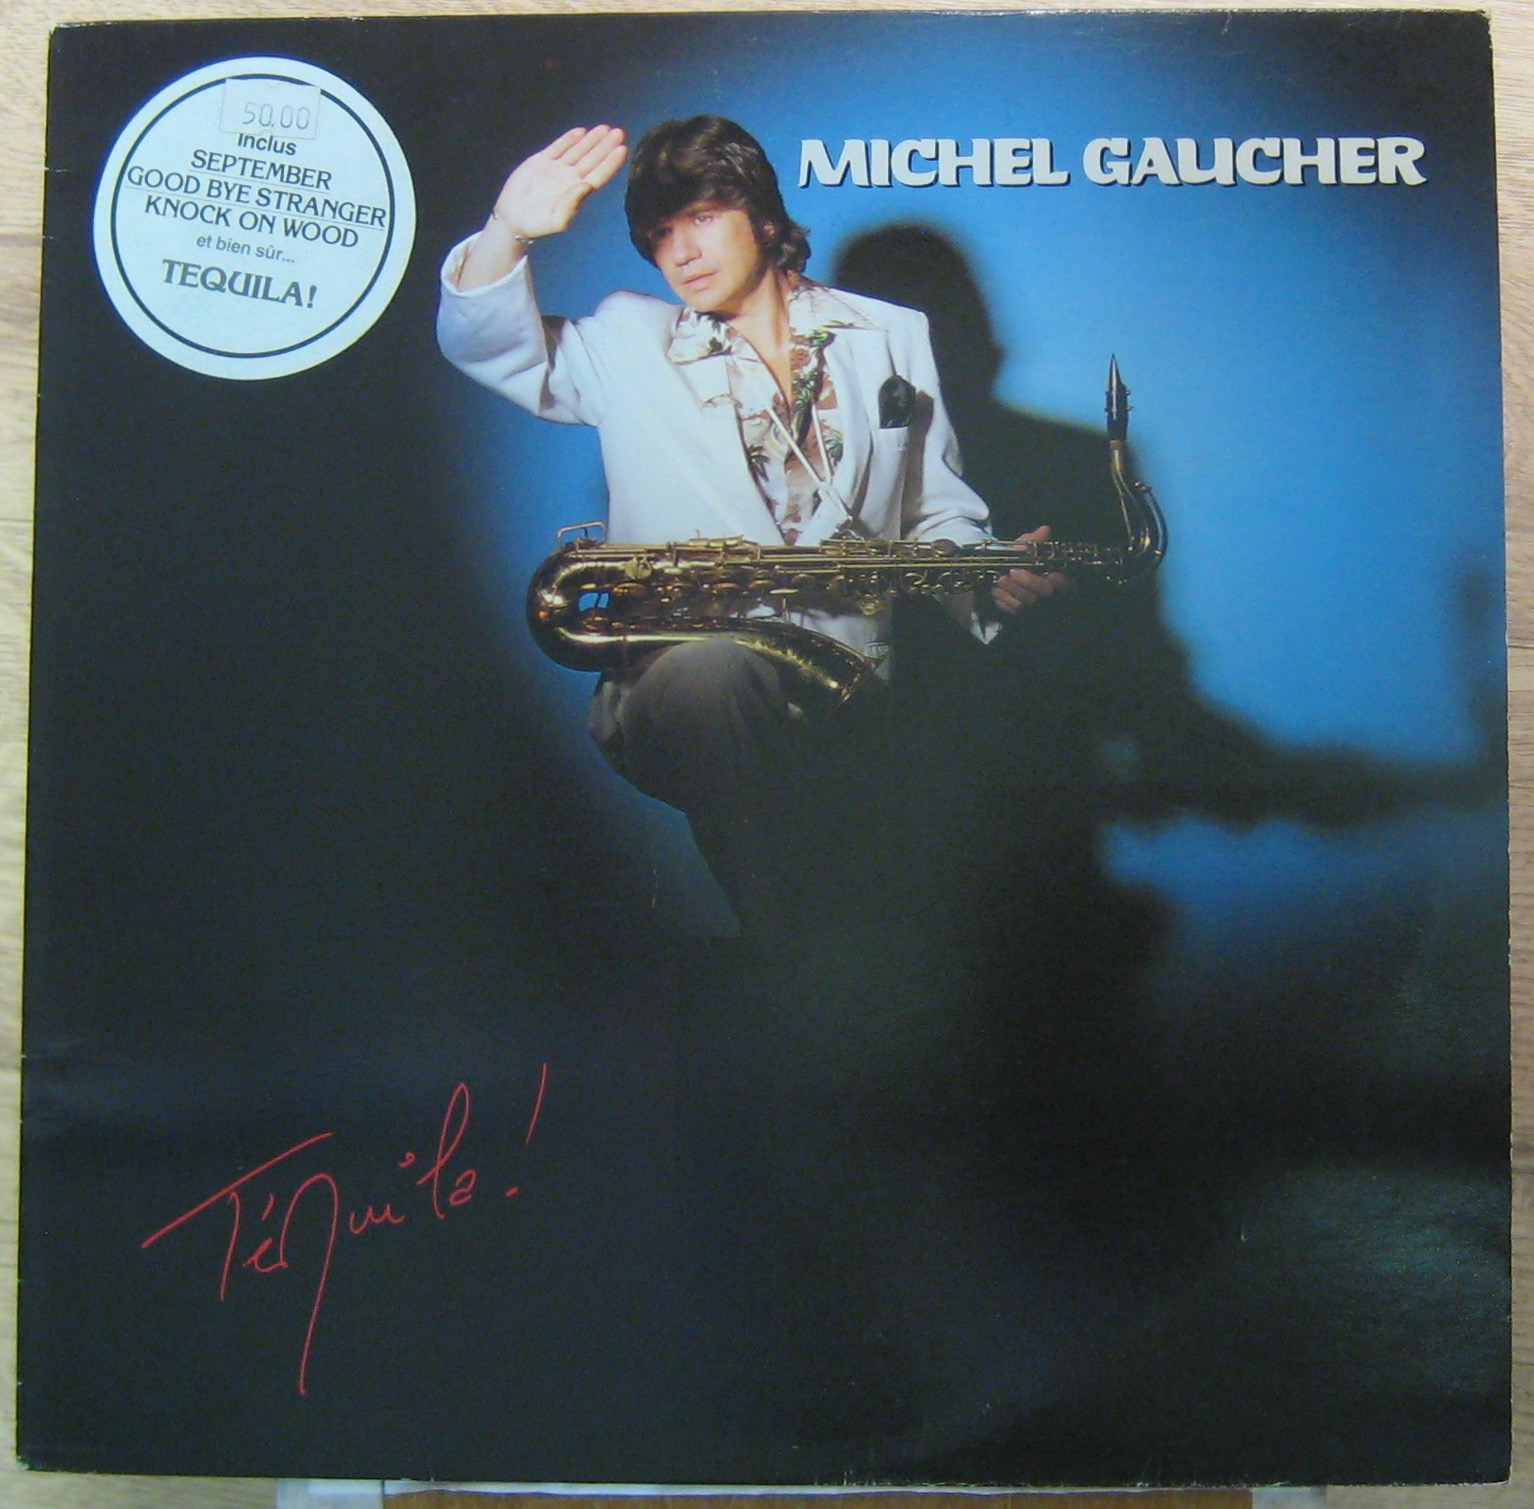 GAUCHER MICHEL - Téquila - LP